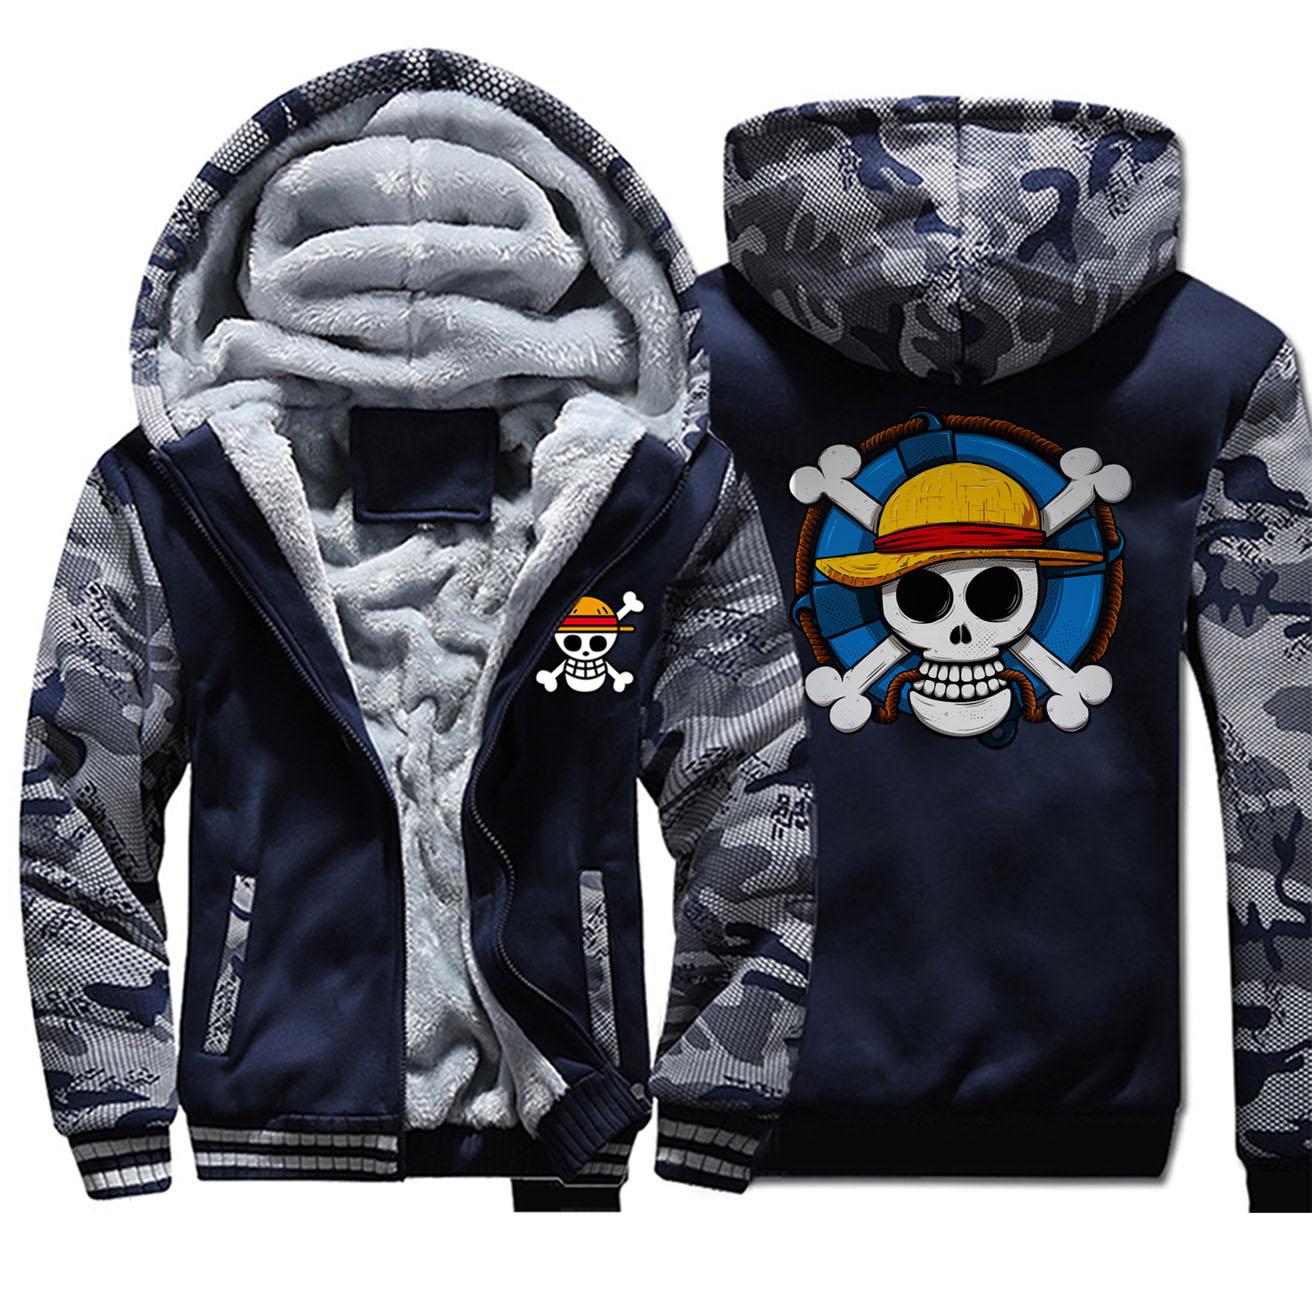 One Piece Luffy Sweater Zip Hoodie Thick Jacket Coat Men Luminous Sweatshirt